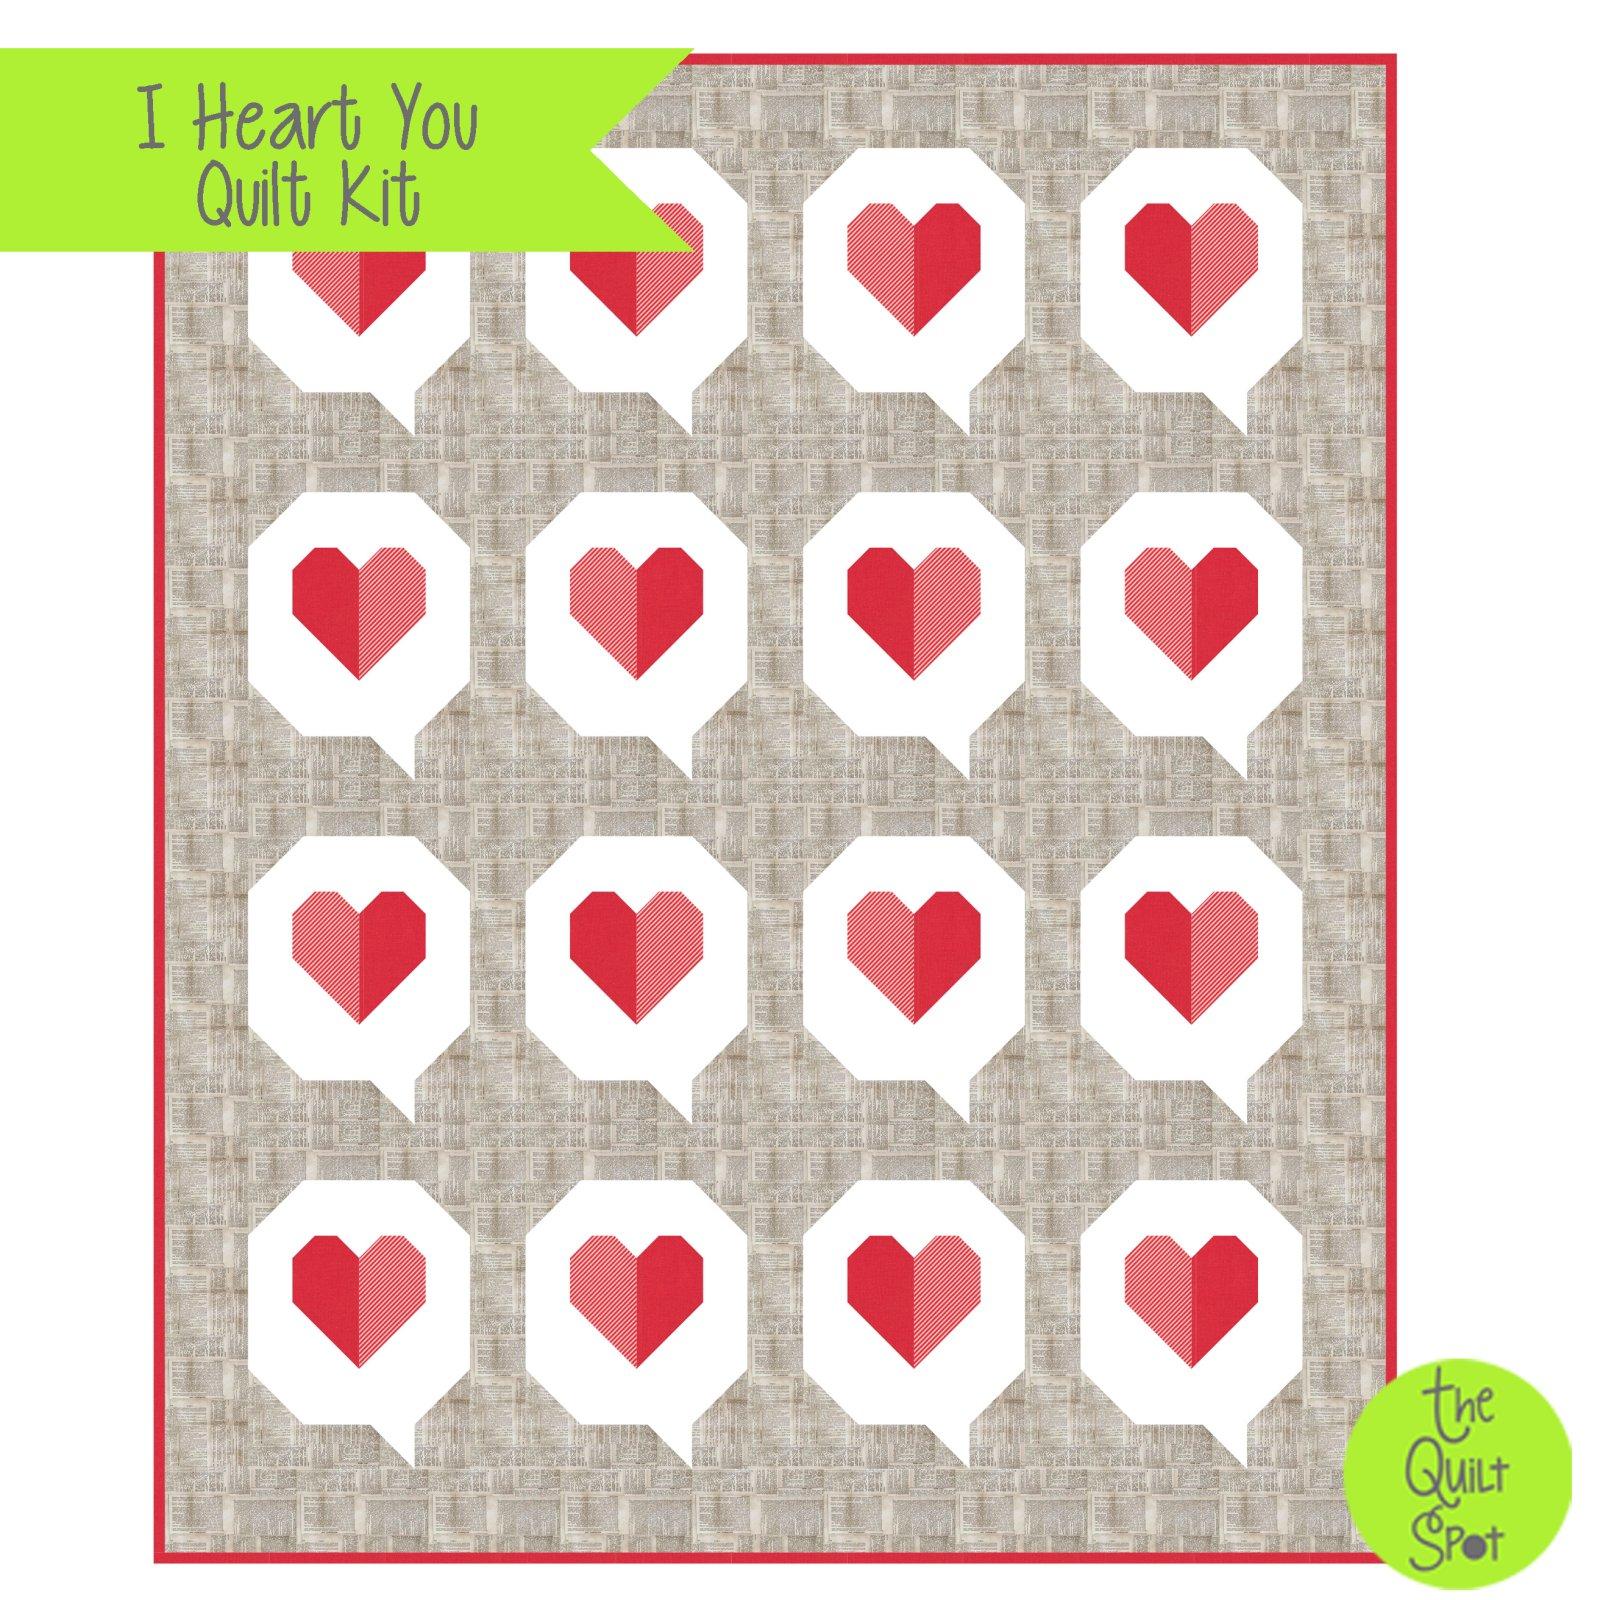 I Heart You Quilt Kit